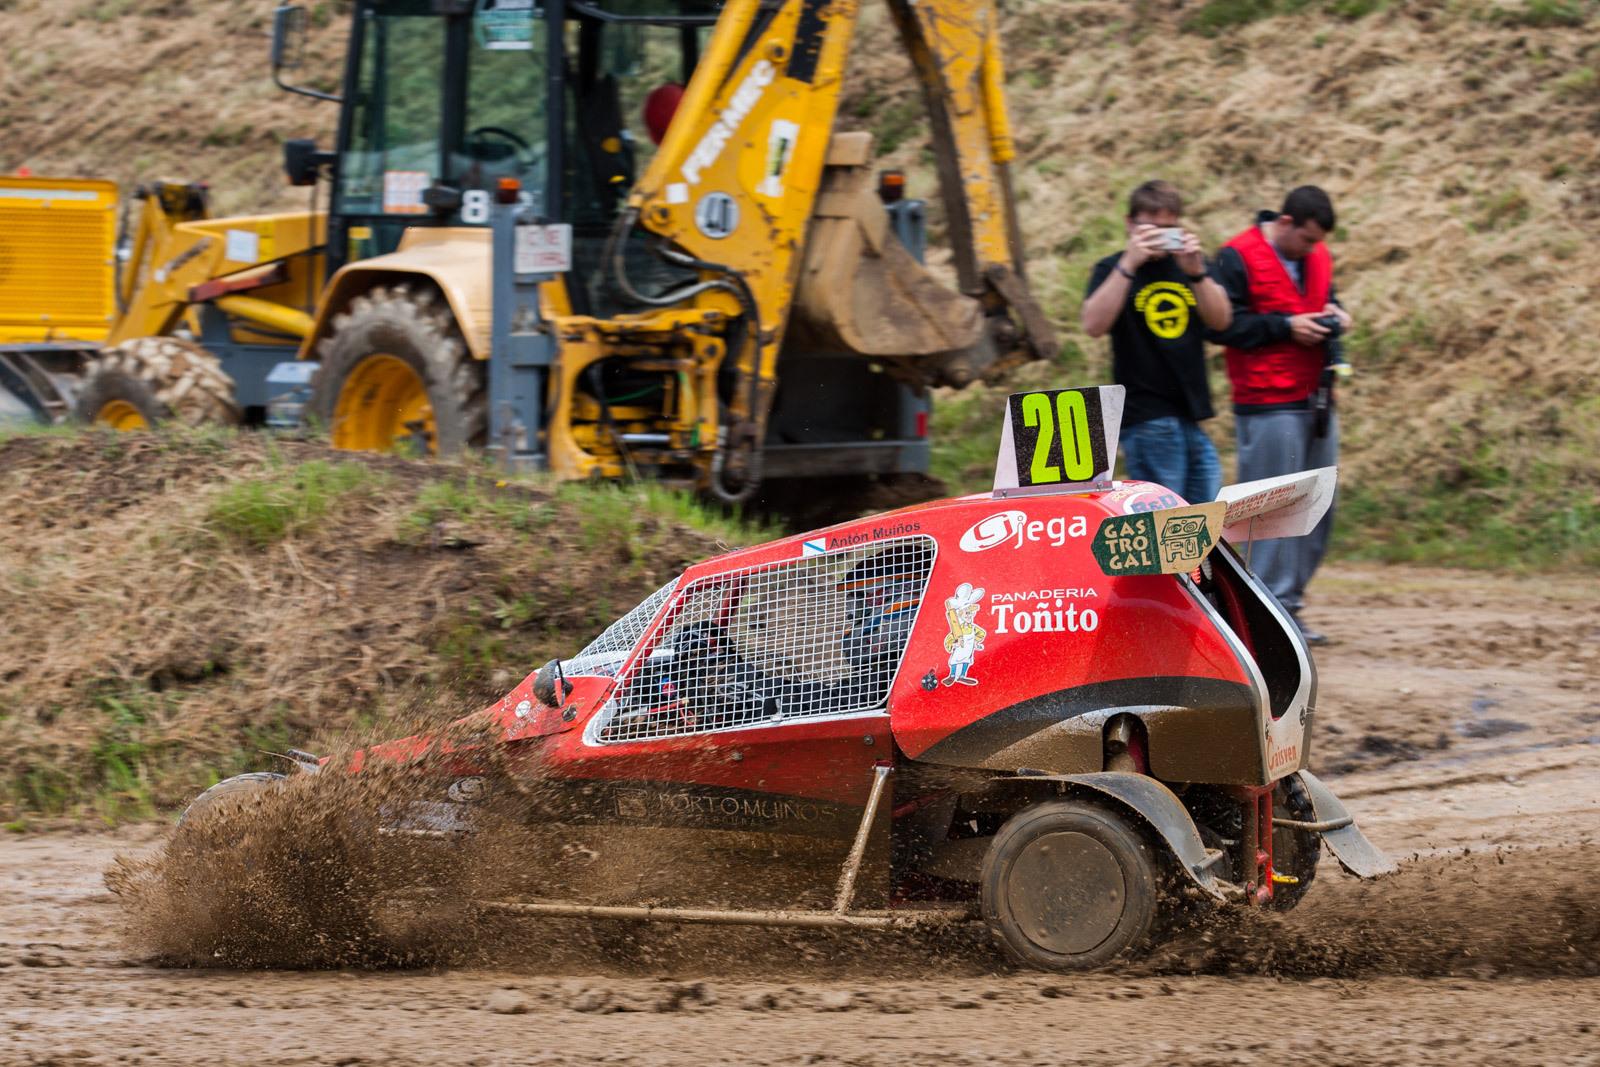 005 Autocross Carballo FGA 2016 009